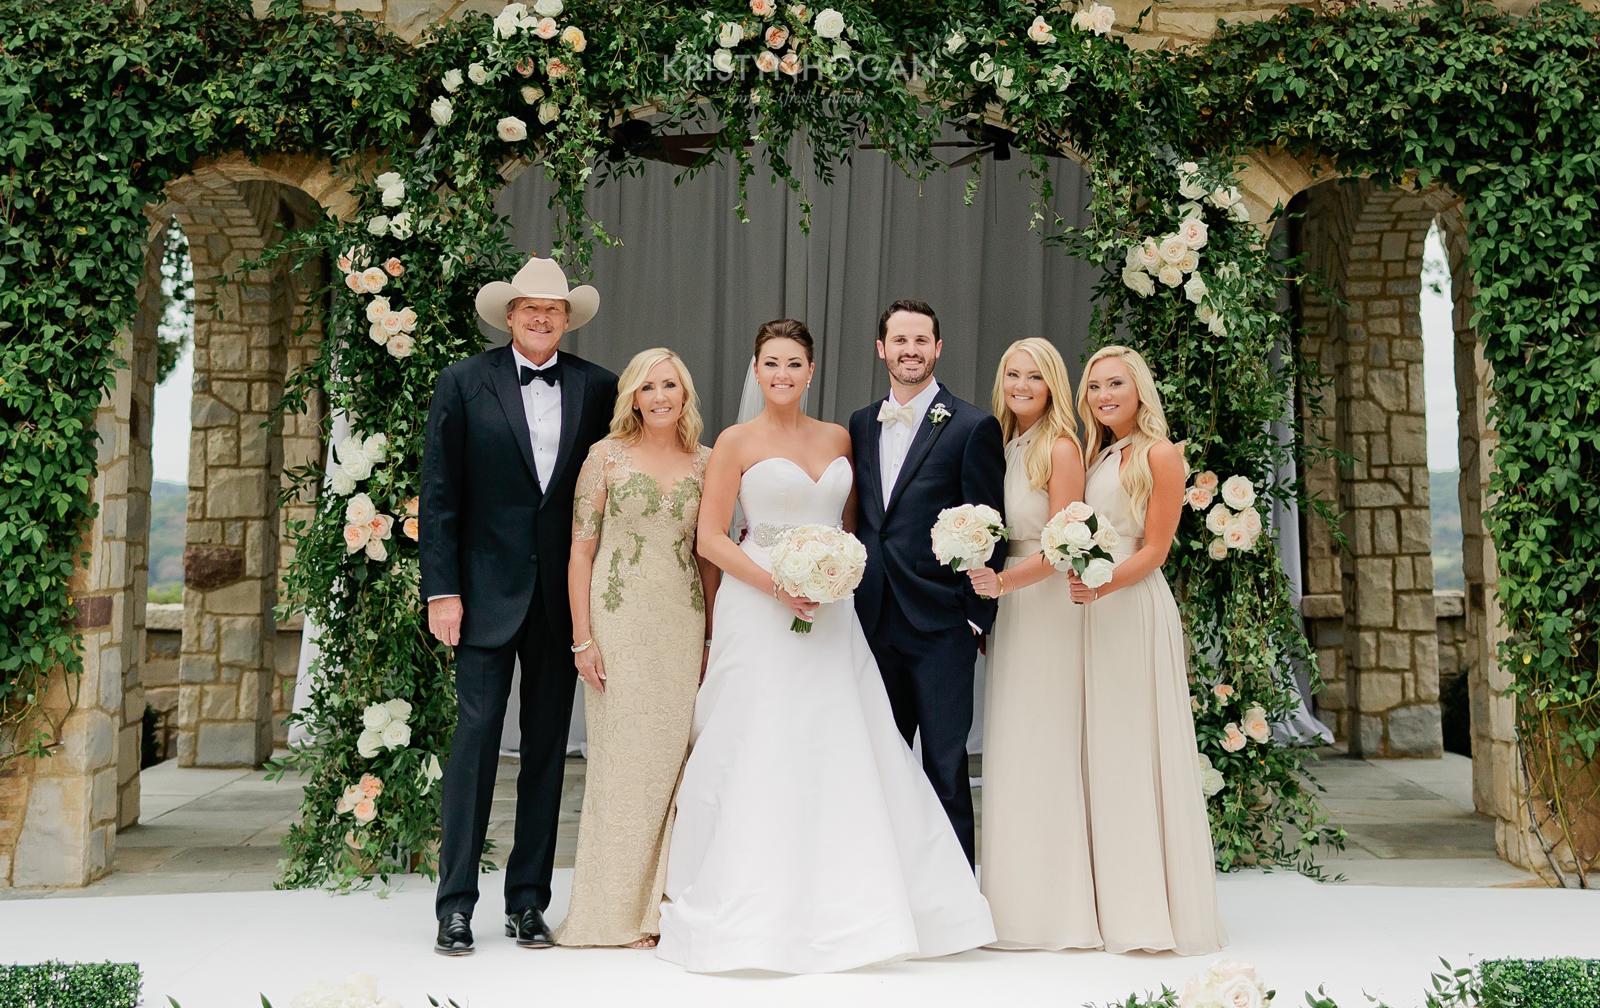 Wedding Attire Rental